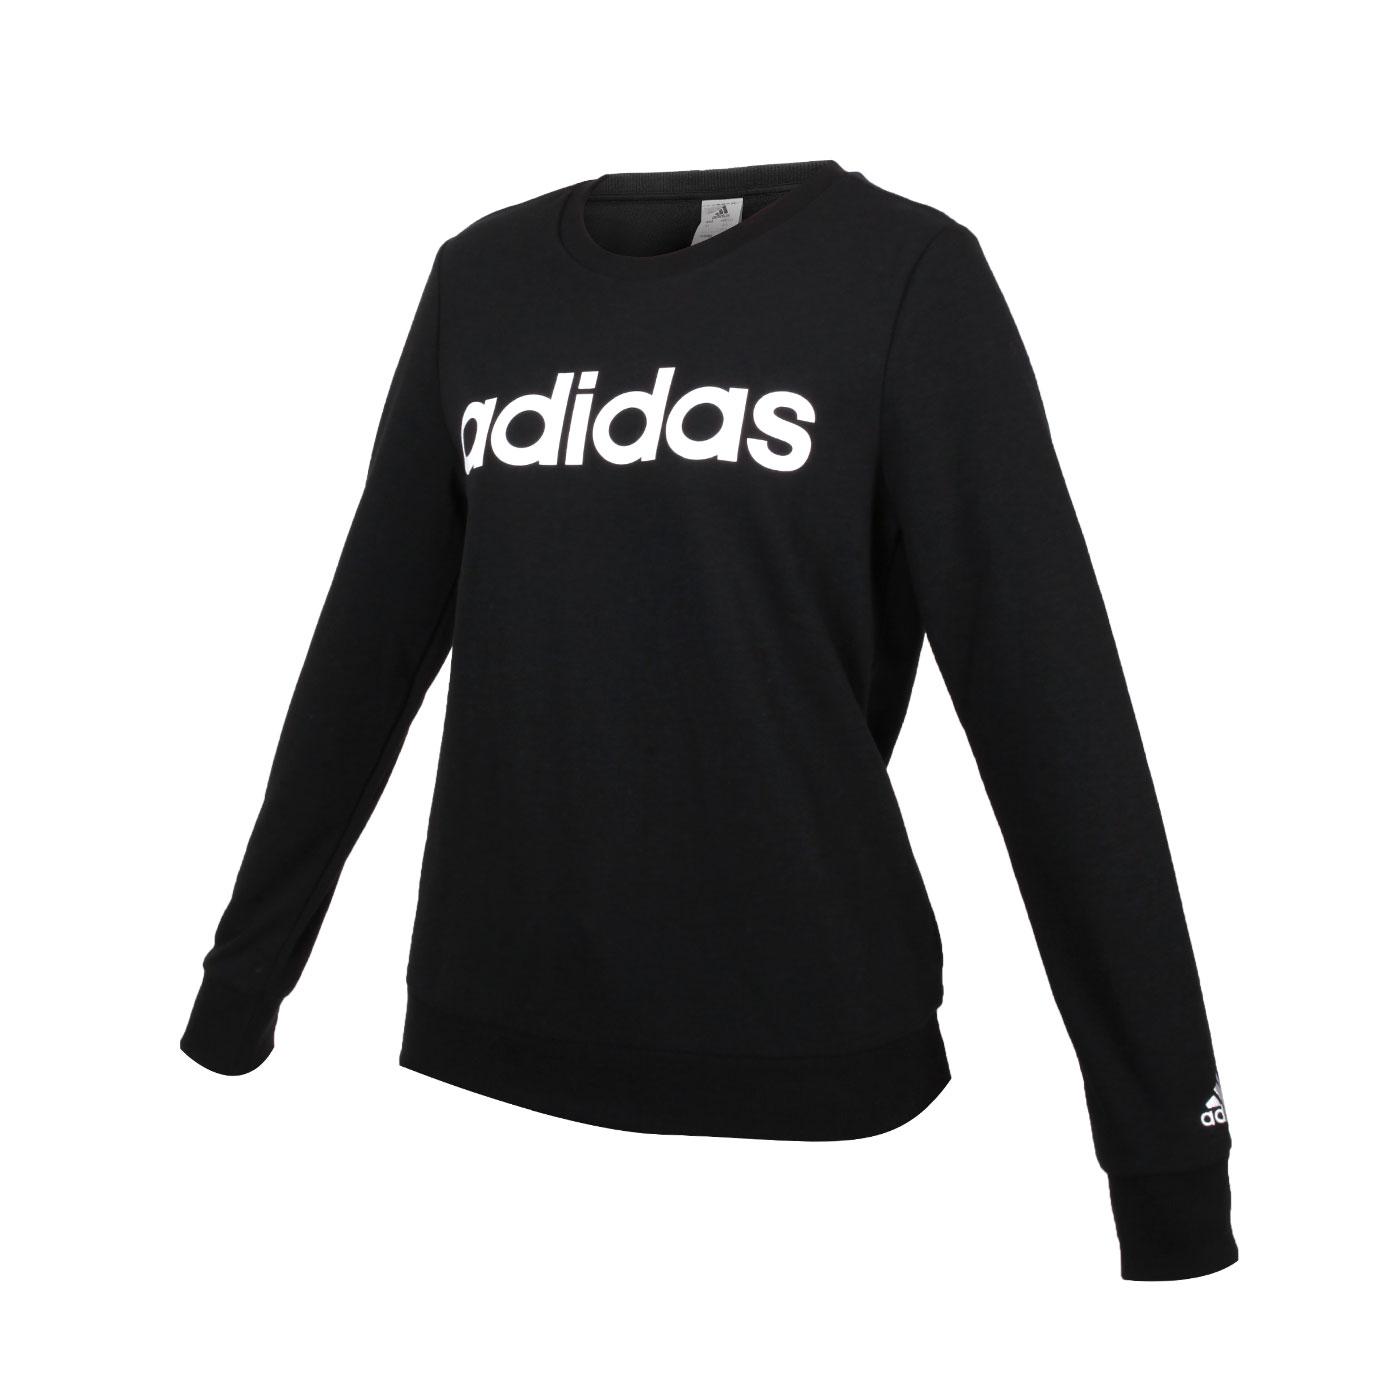 ADIDAS 女款長袖T恤 GL0718